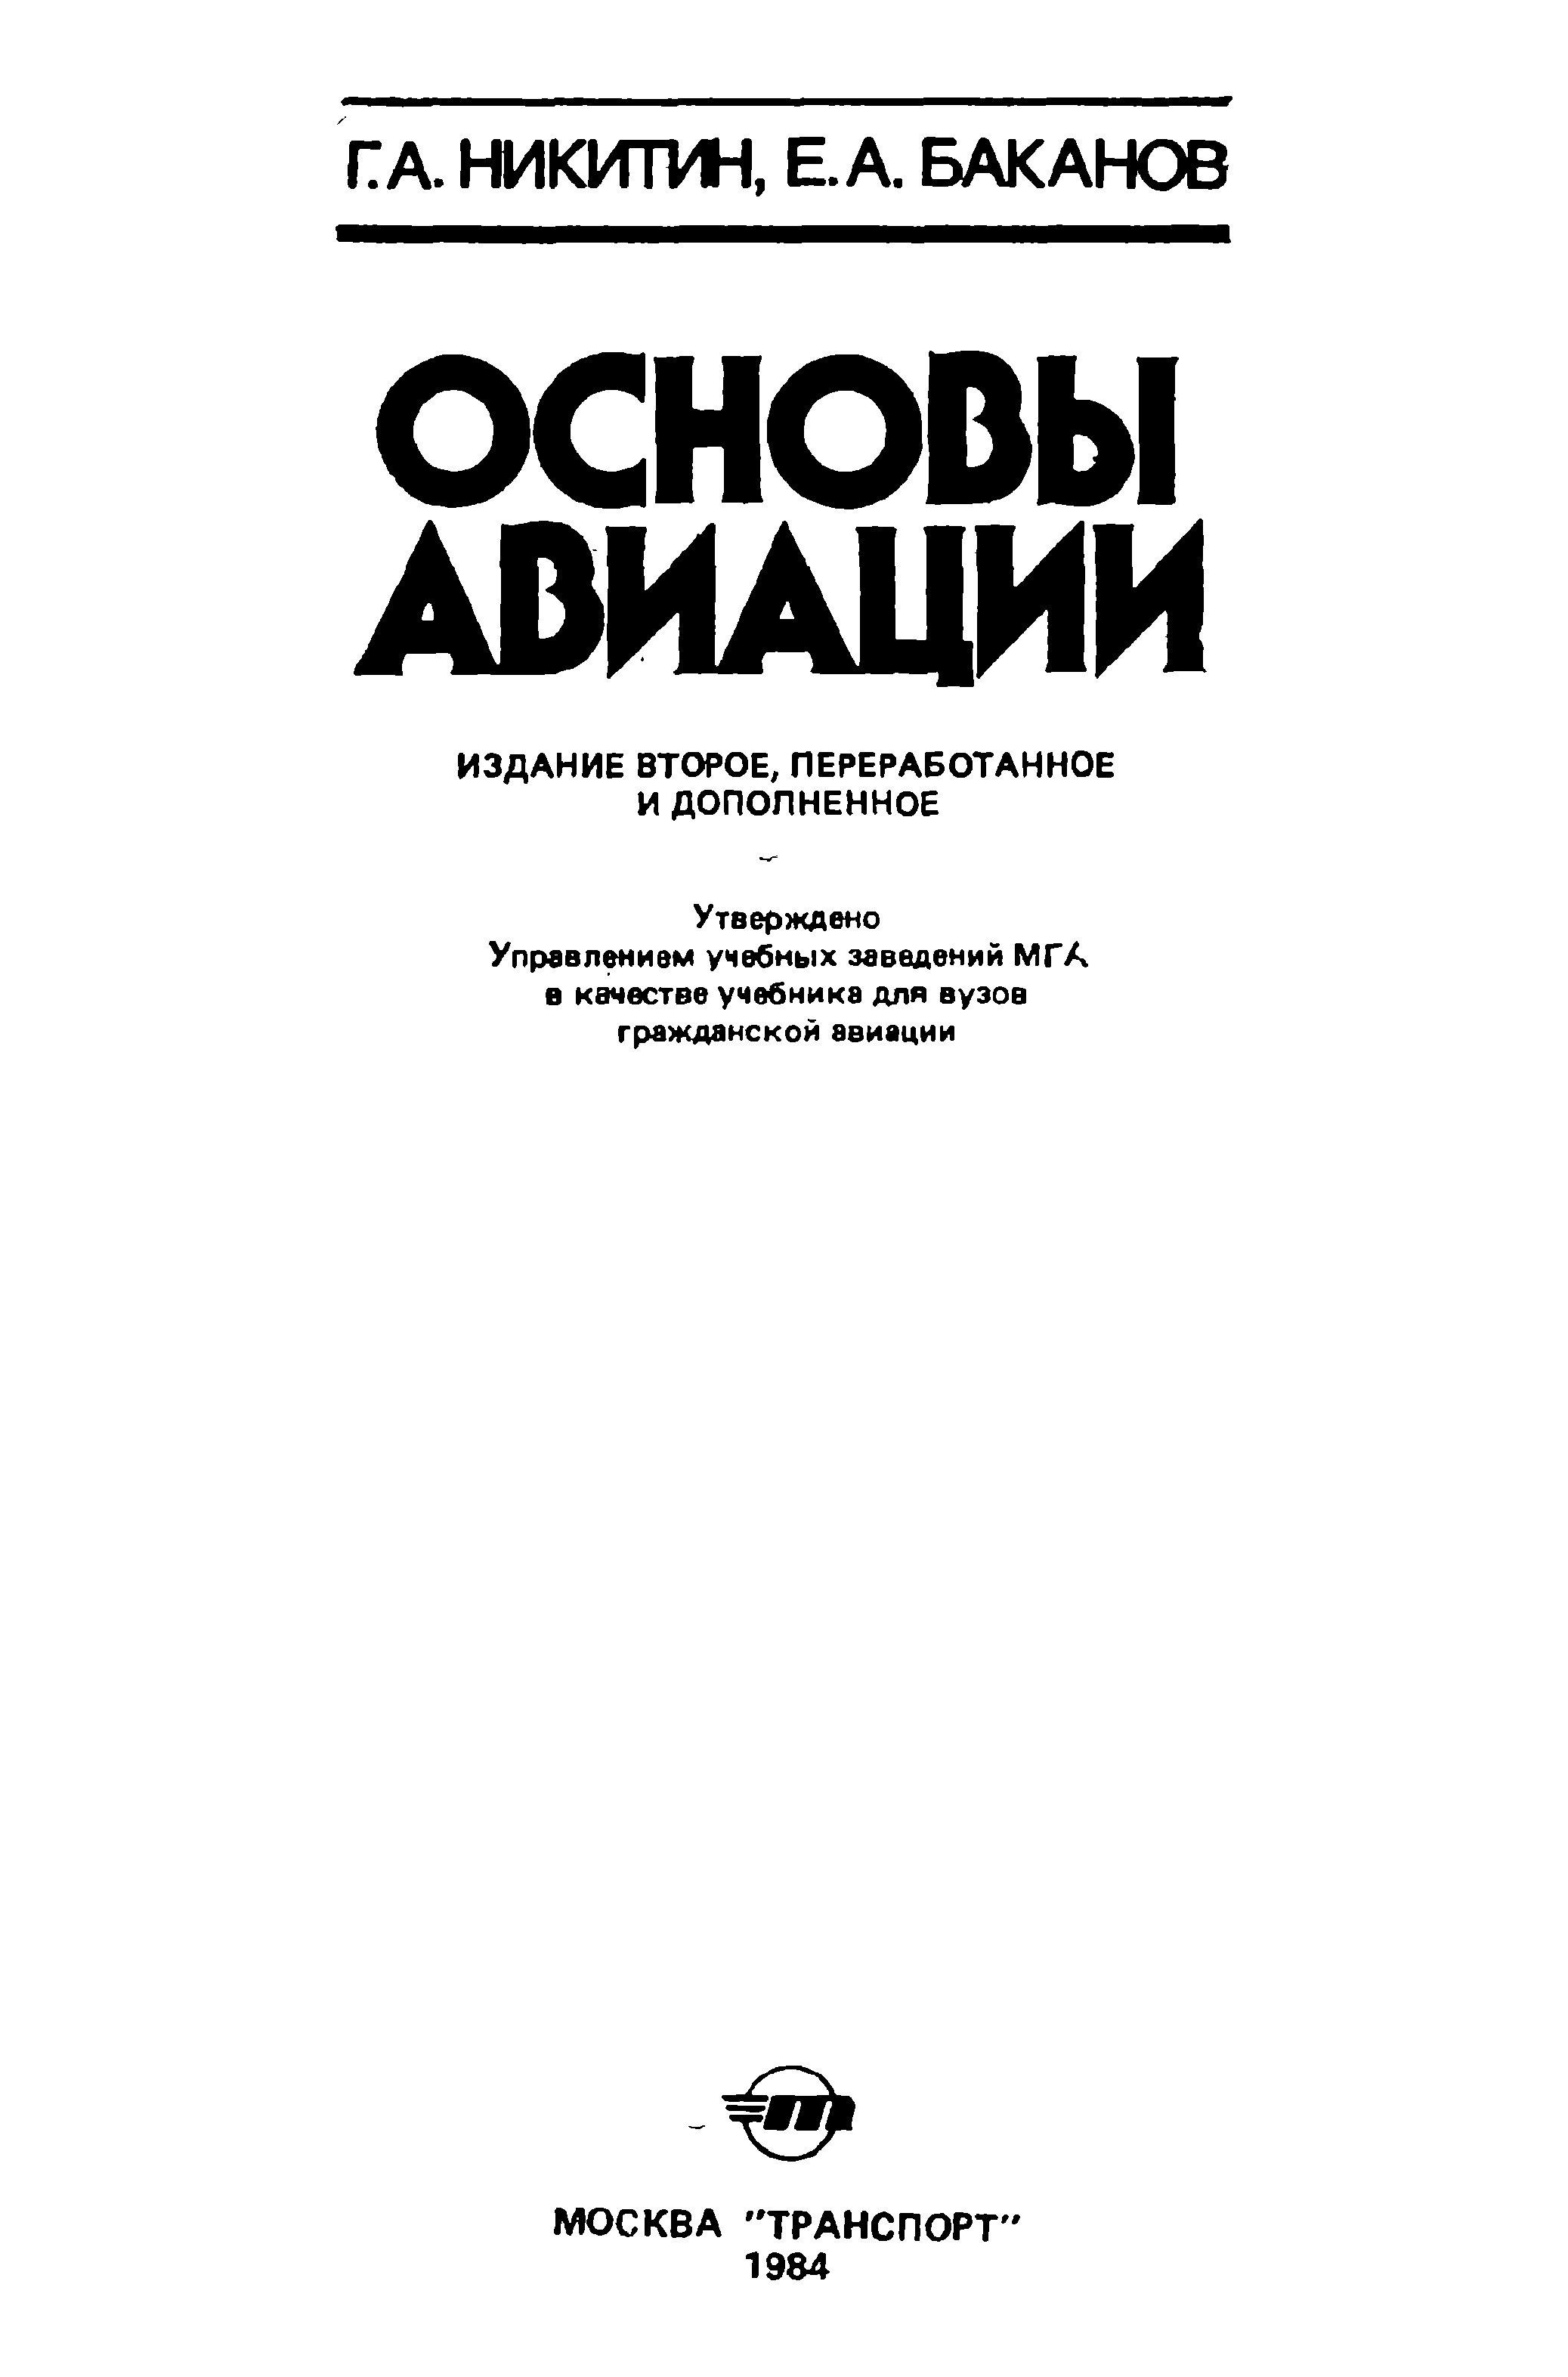 Обложка книги Основы авиации (Никитин Г.А., Баканов Е.А)